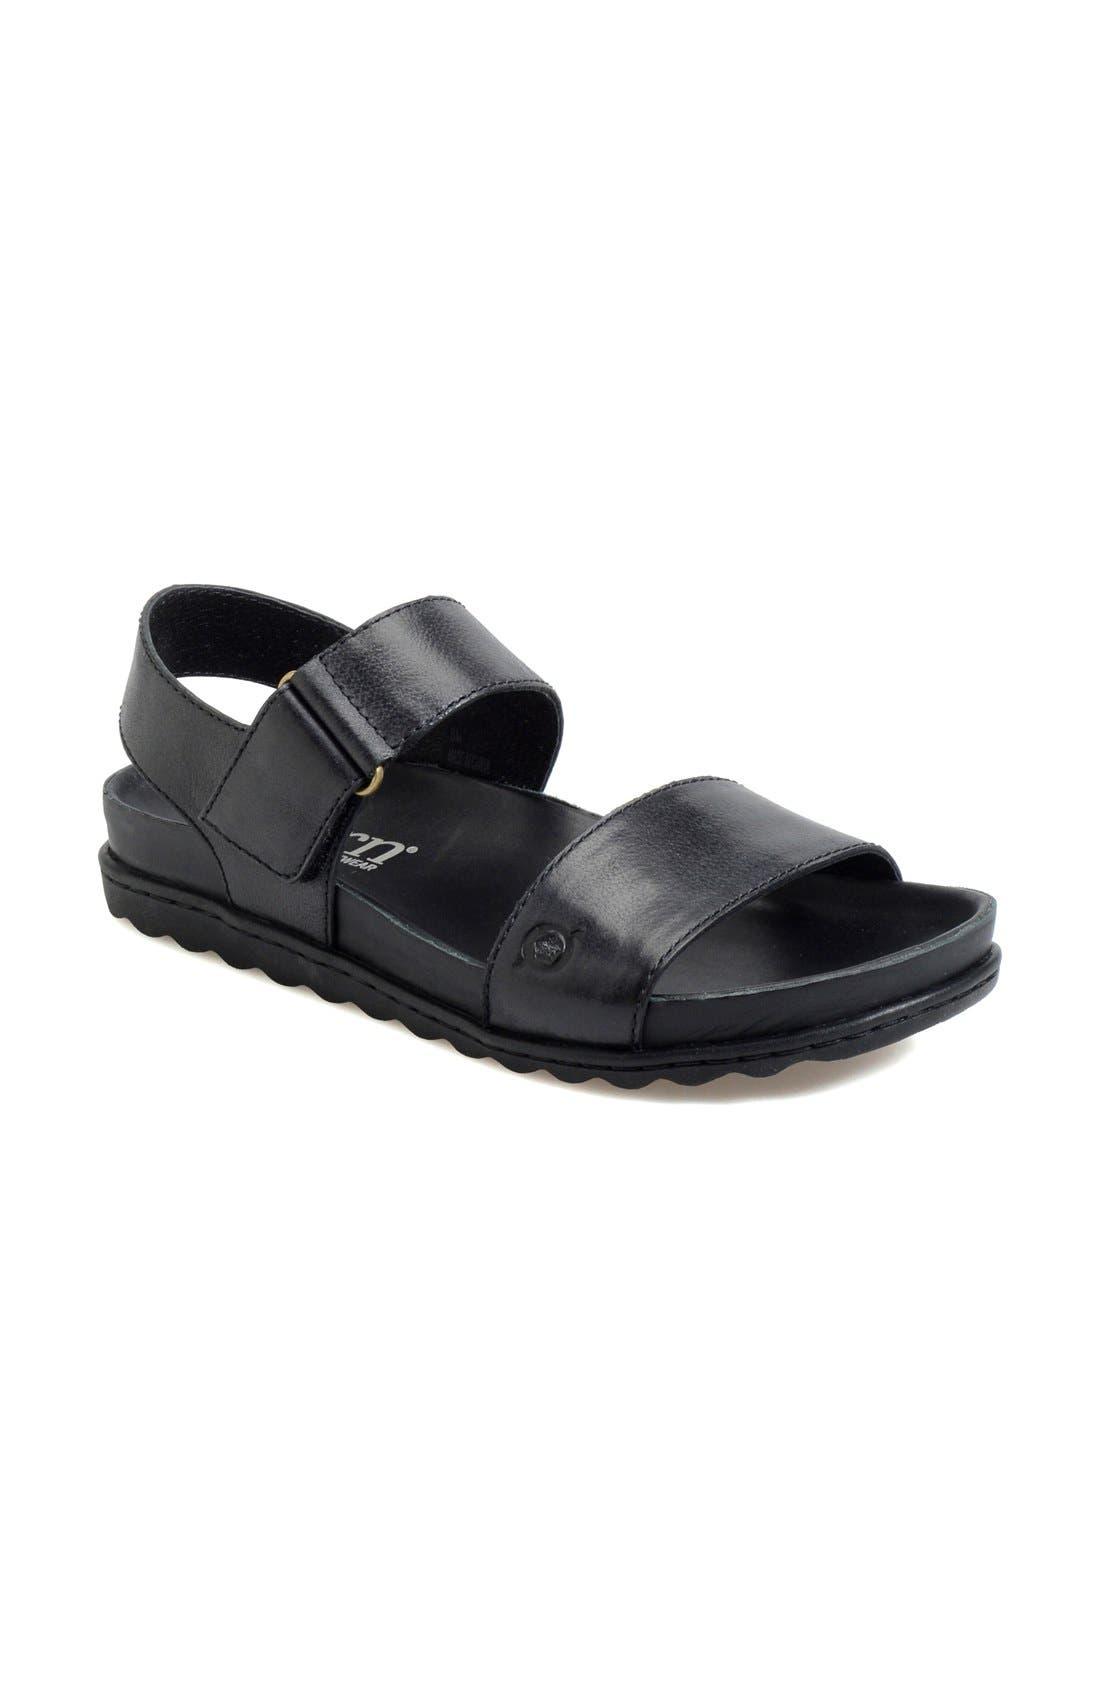 Main Image - Børn 'Mardel' Leather Sandal (Women)